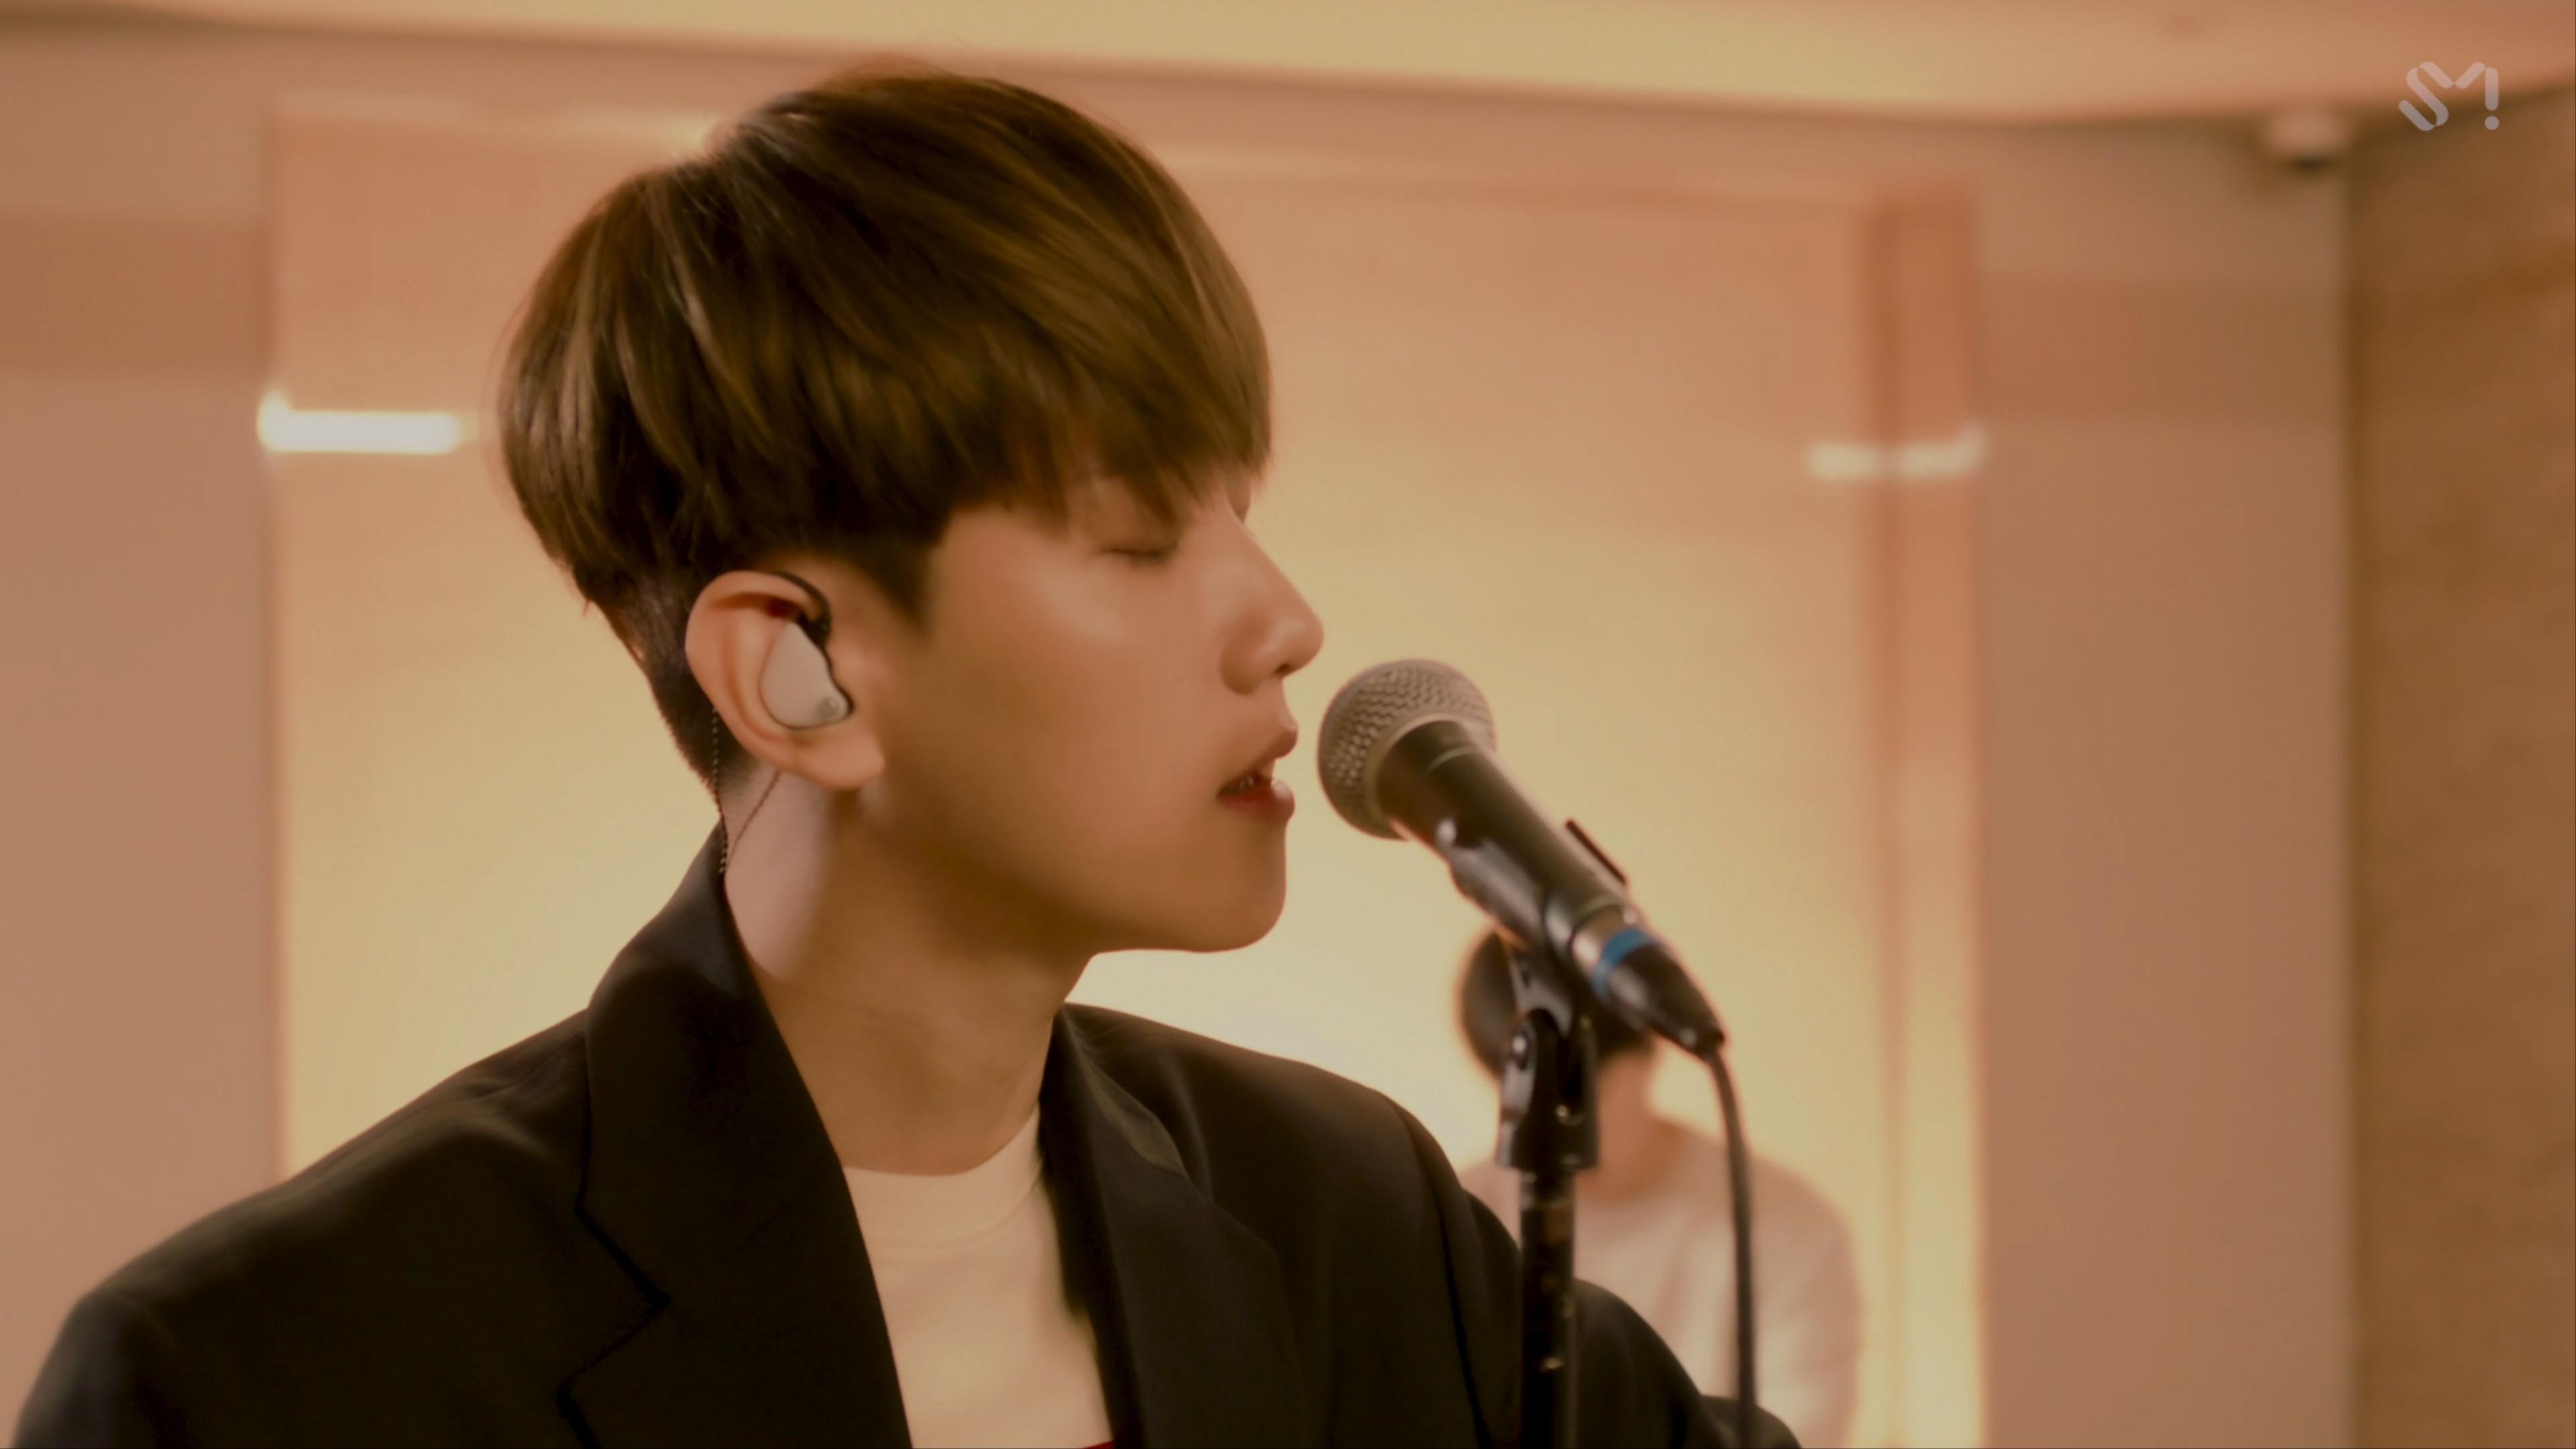 [STATION] BAEKHYUN 백현 'Love Again' Live Video